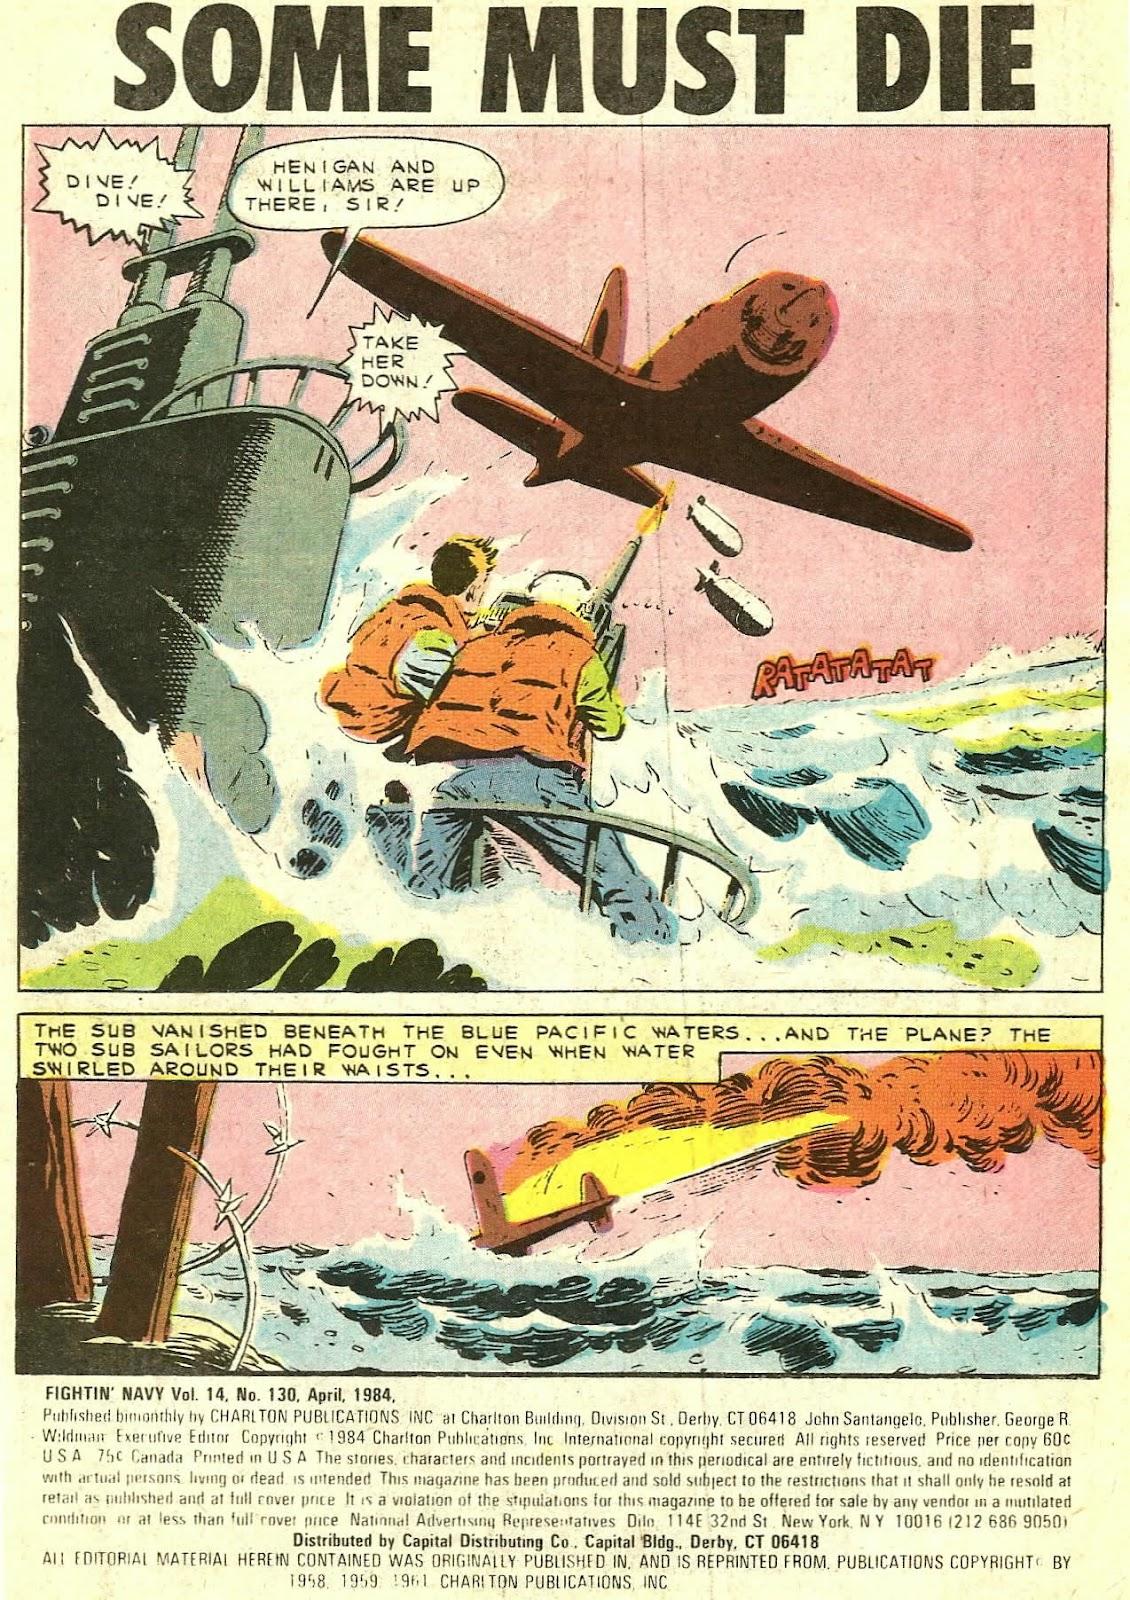 Read online Fightin' Navy comic -  Issue #130 - 3